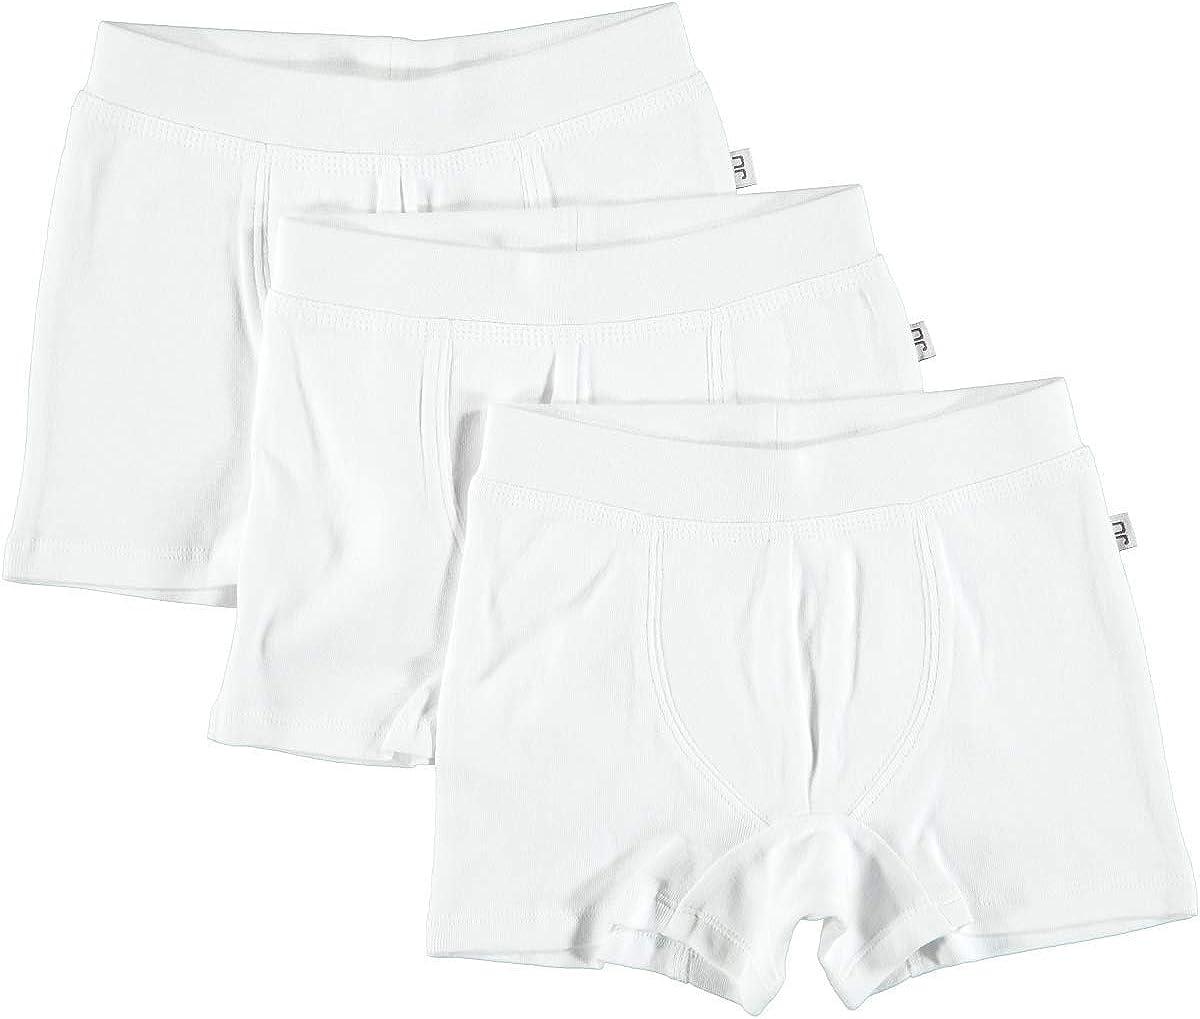 ragazzo JOLO Underwear Basic Boxer